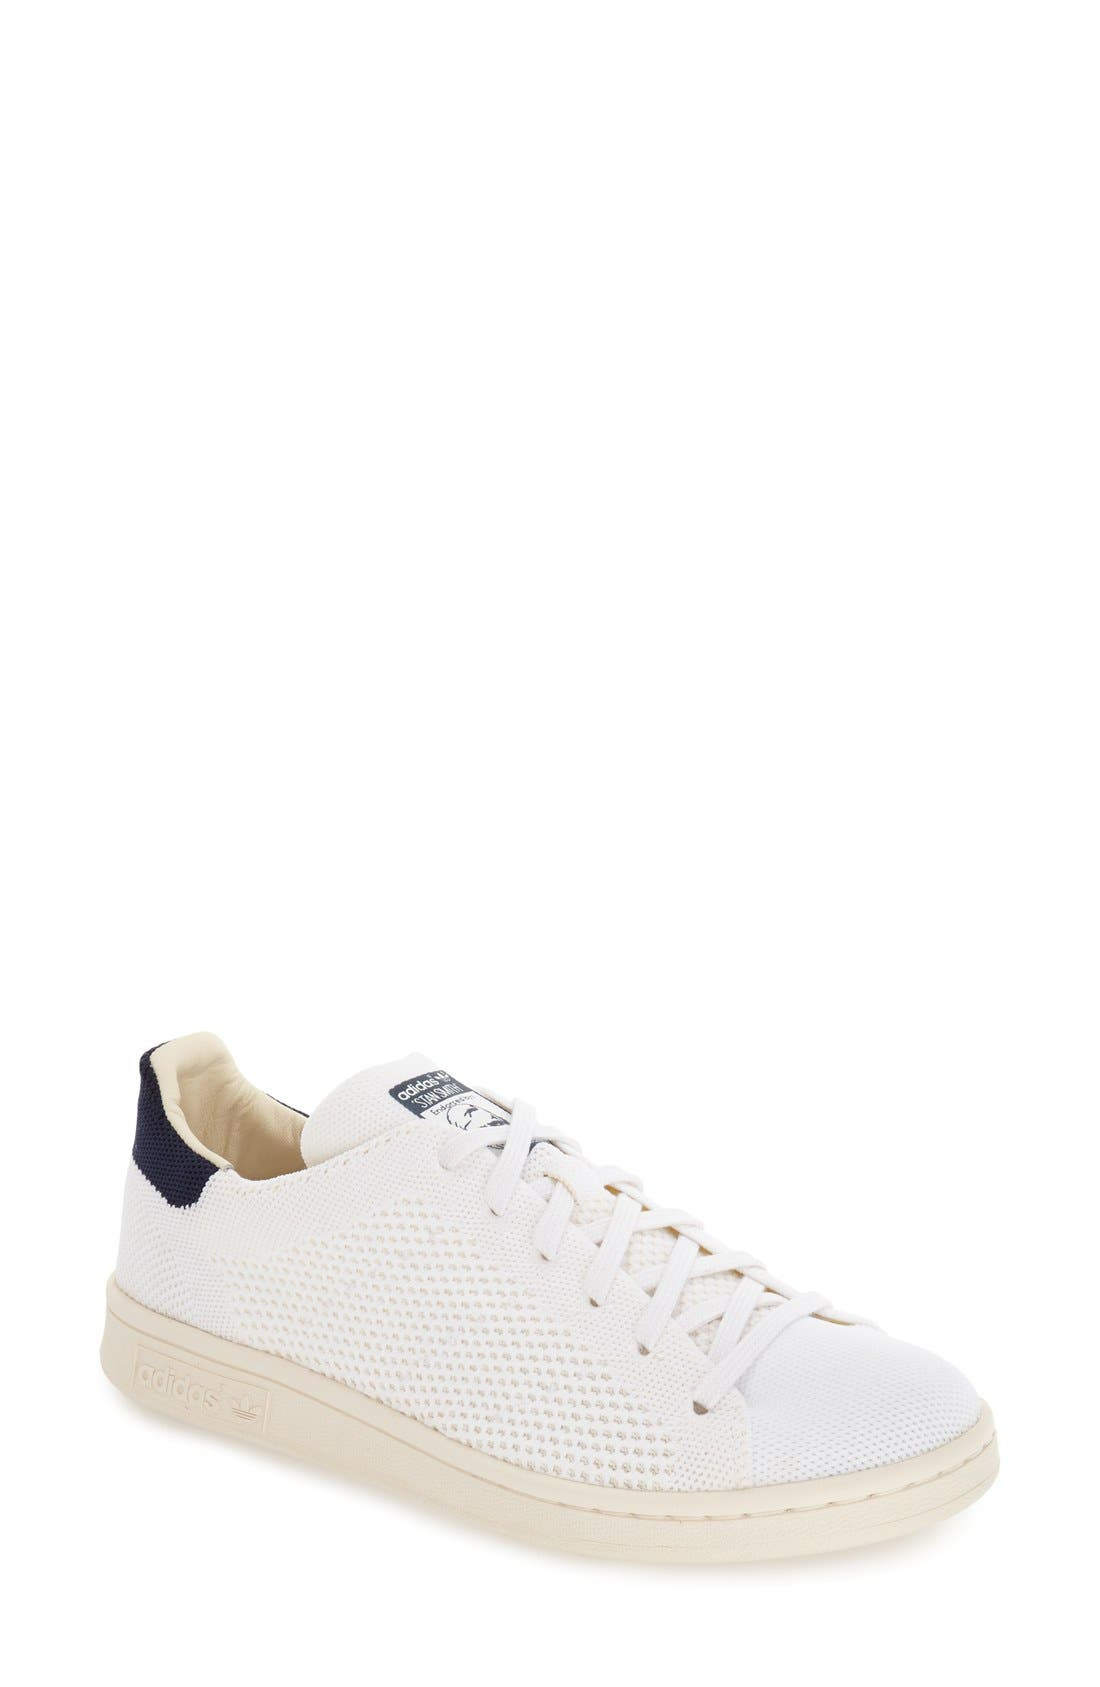 Main Image - adidas 'Stan Smith' Primeknit Woven Sneaker (Women)